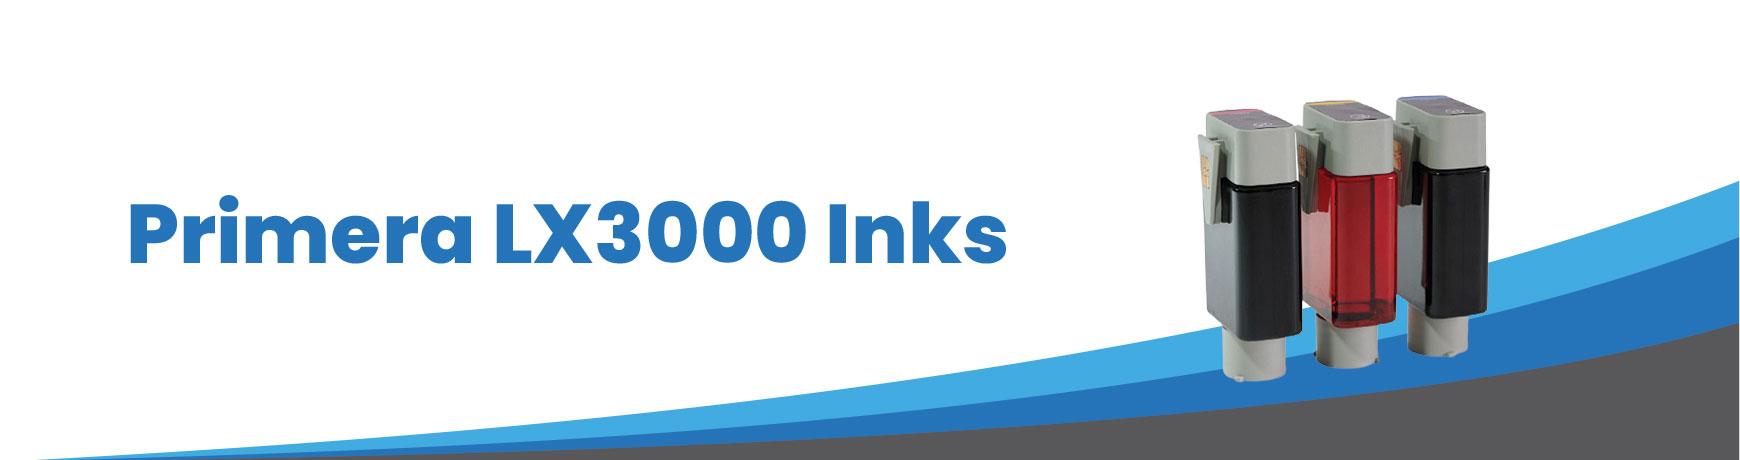 Primera LX3000 Inks